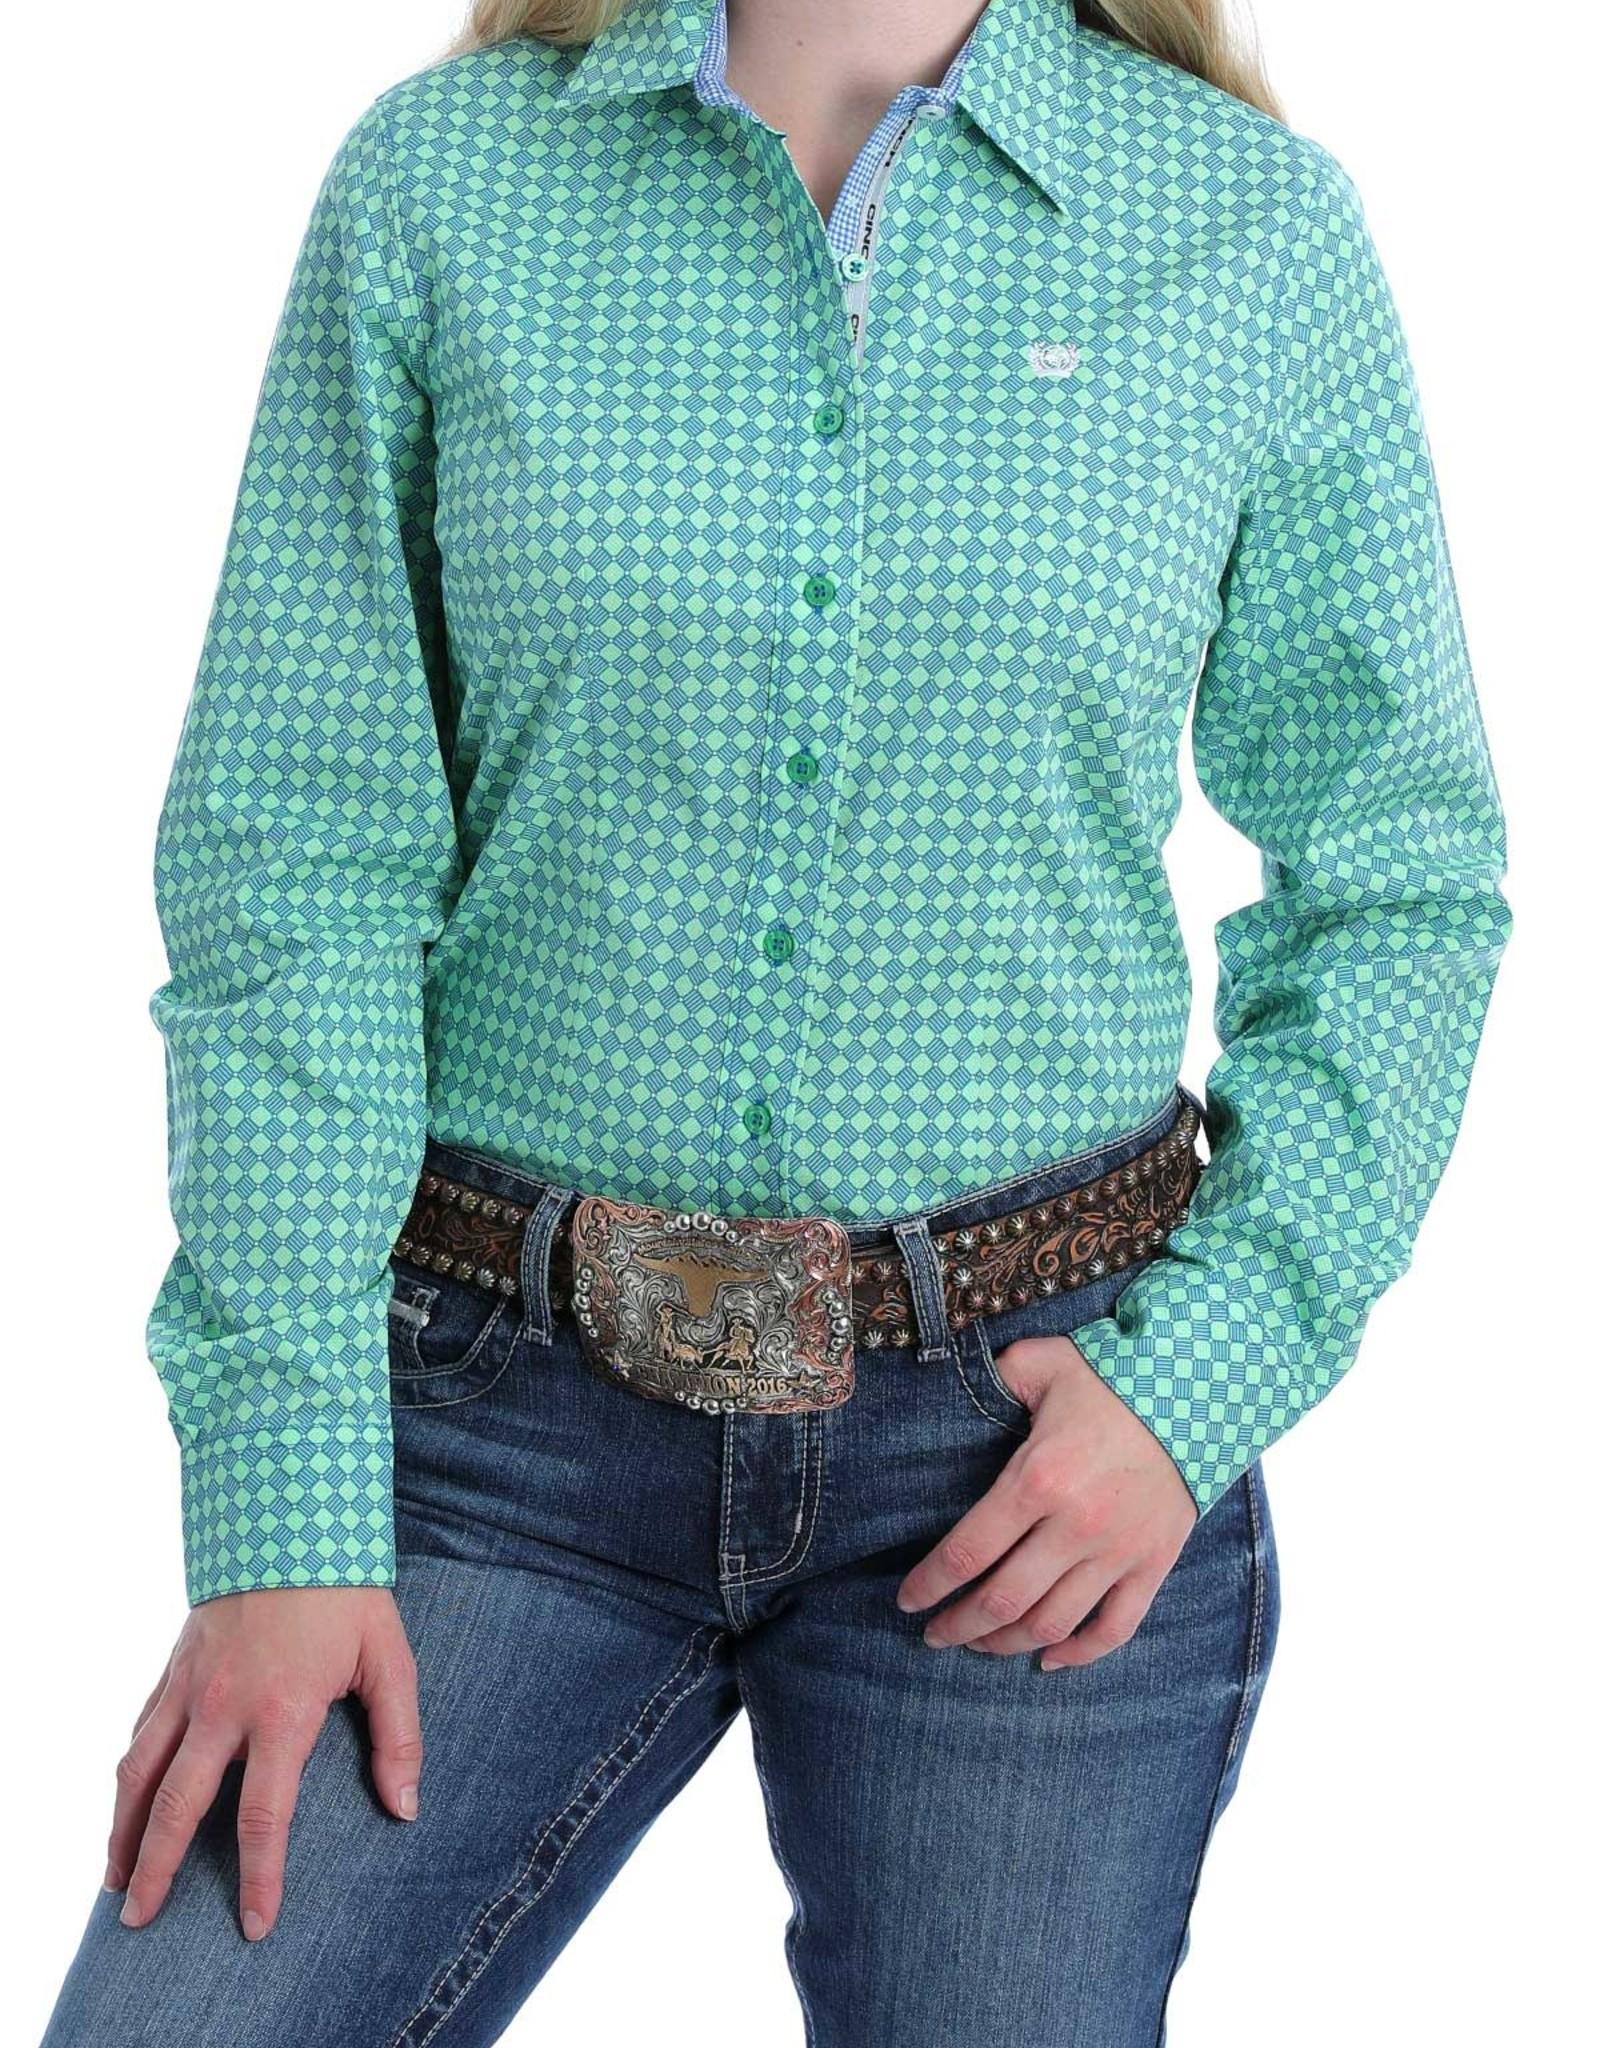 Cinch Womens Cinch Button Down Shirt Lime Green Royal Blue Pattern